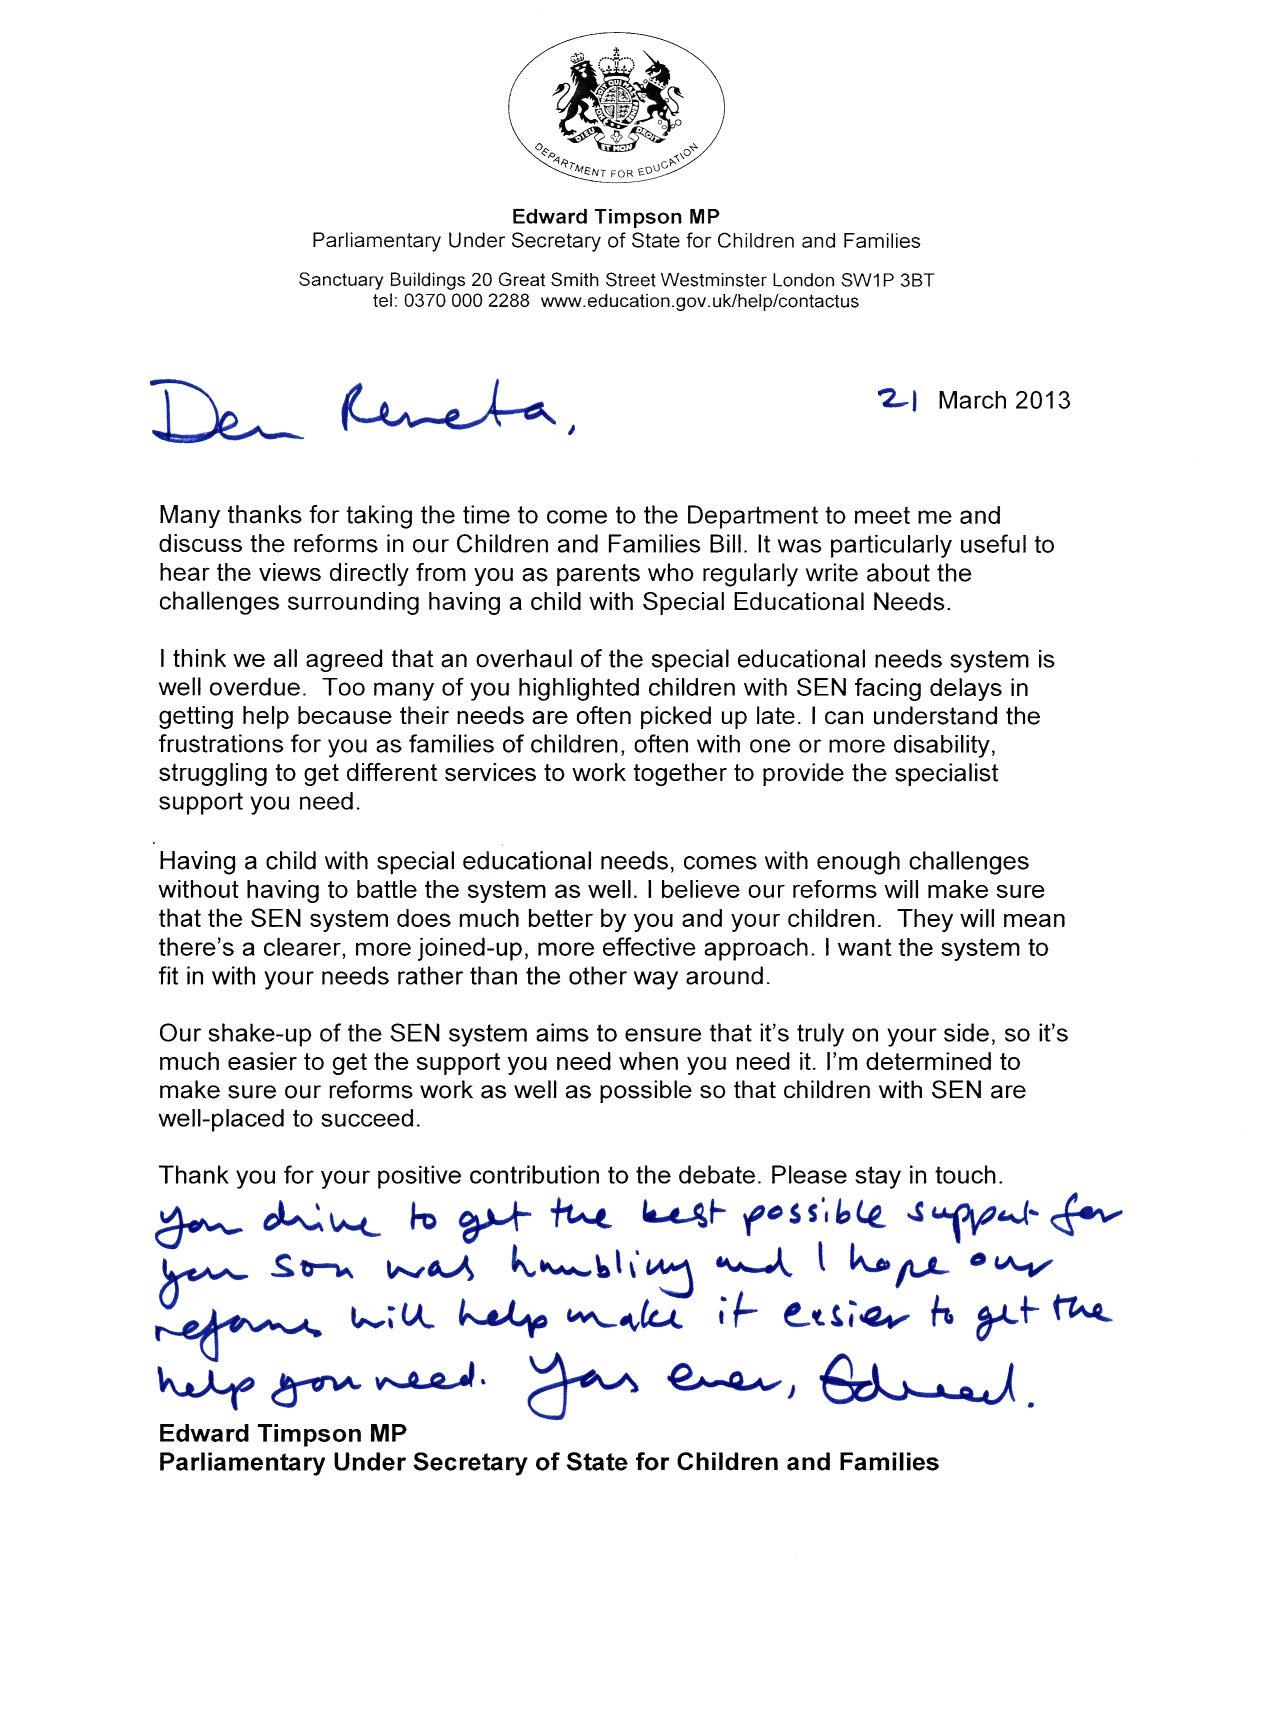 Edward Timpson letter to Renata Blower